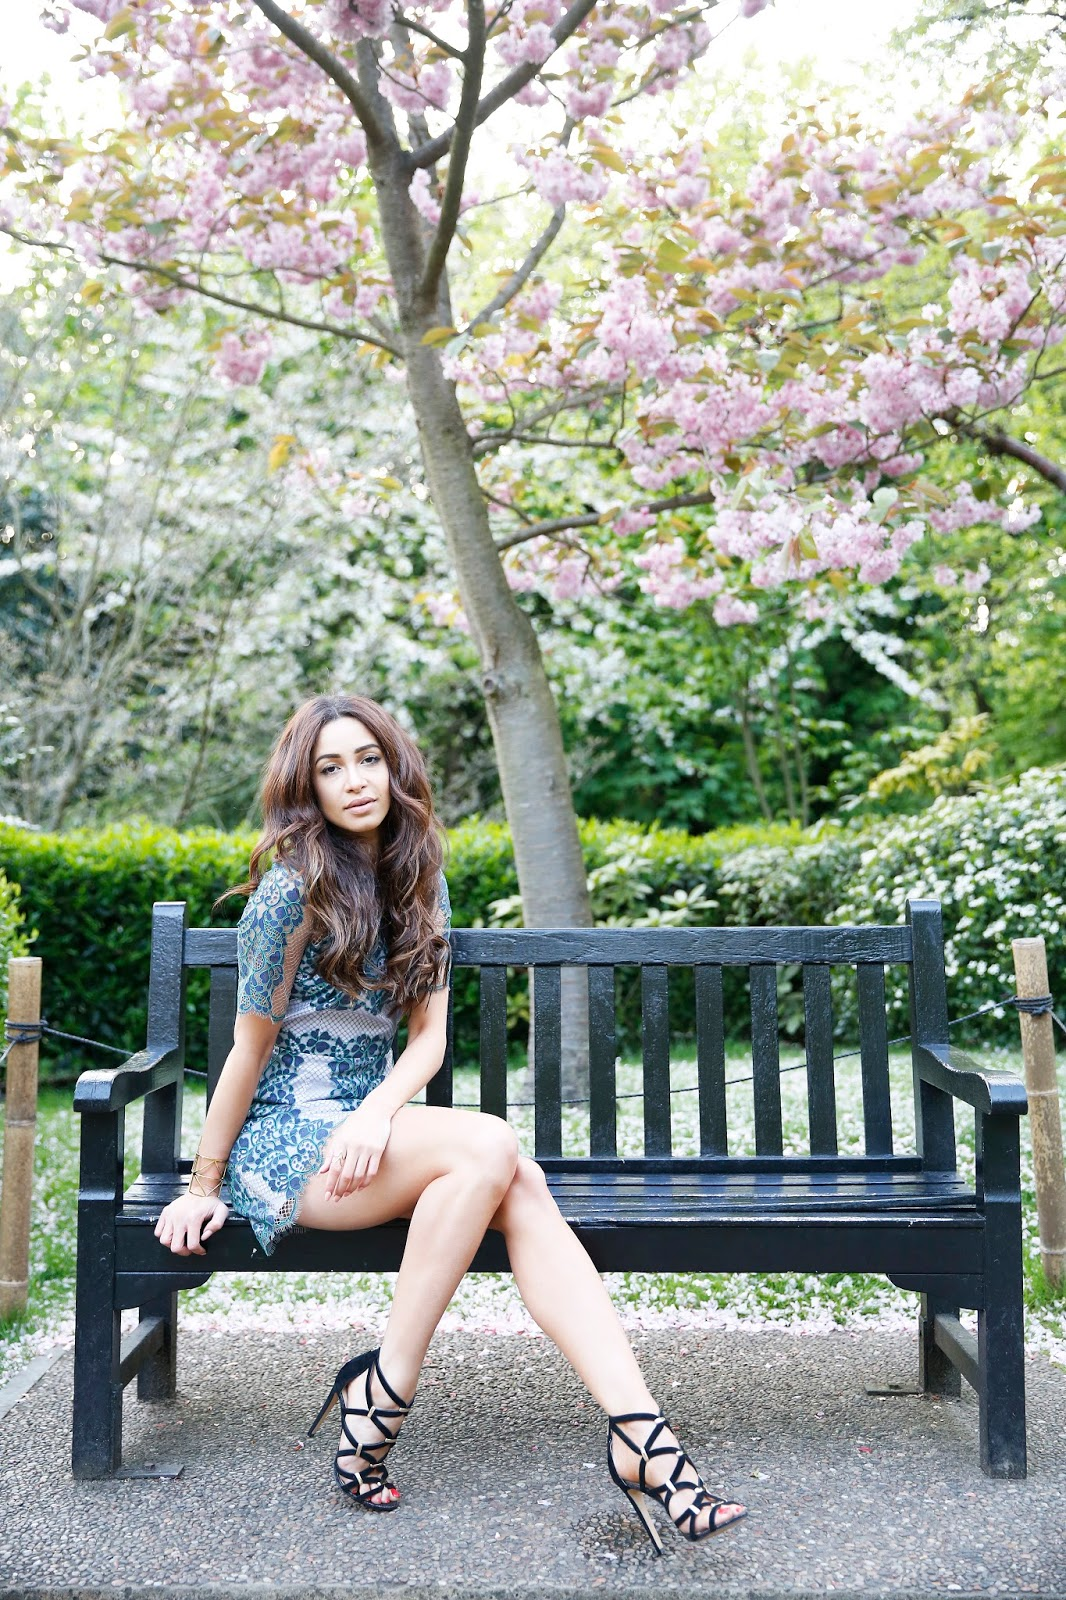 London Fashion Photographer & Blogger